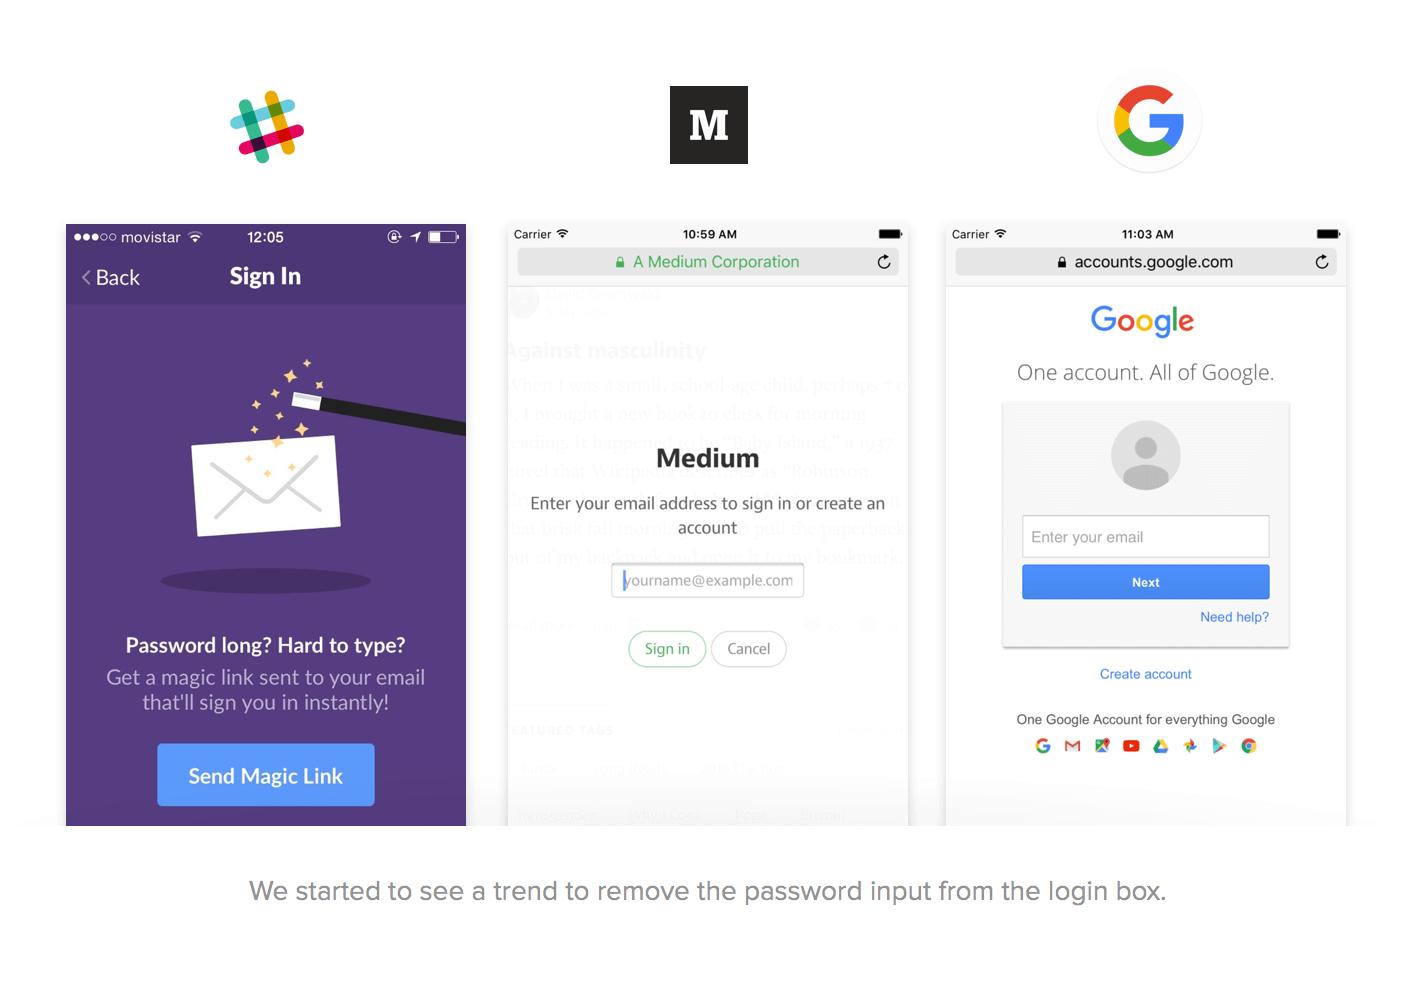 Slack, Medium, and Google login screens